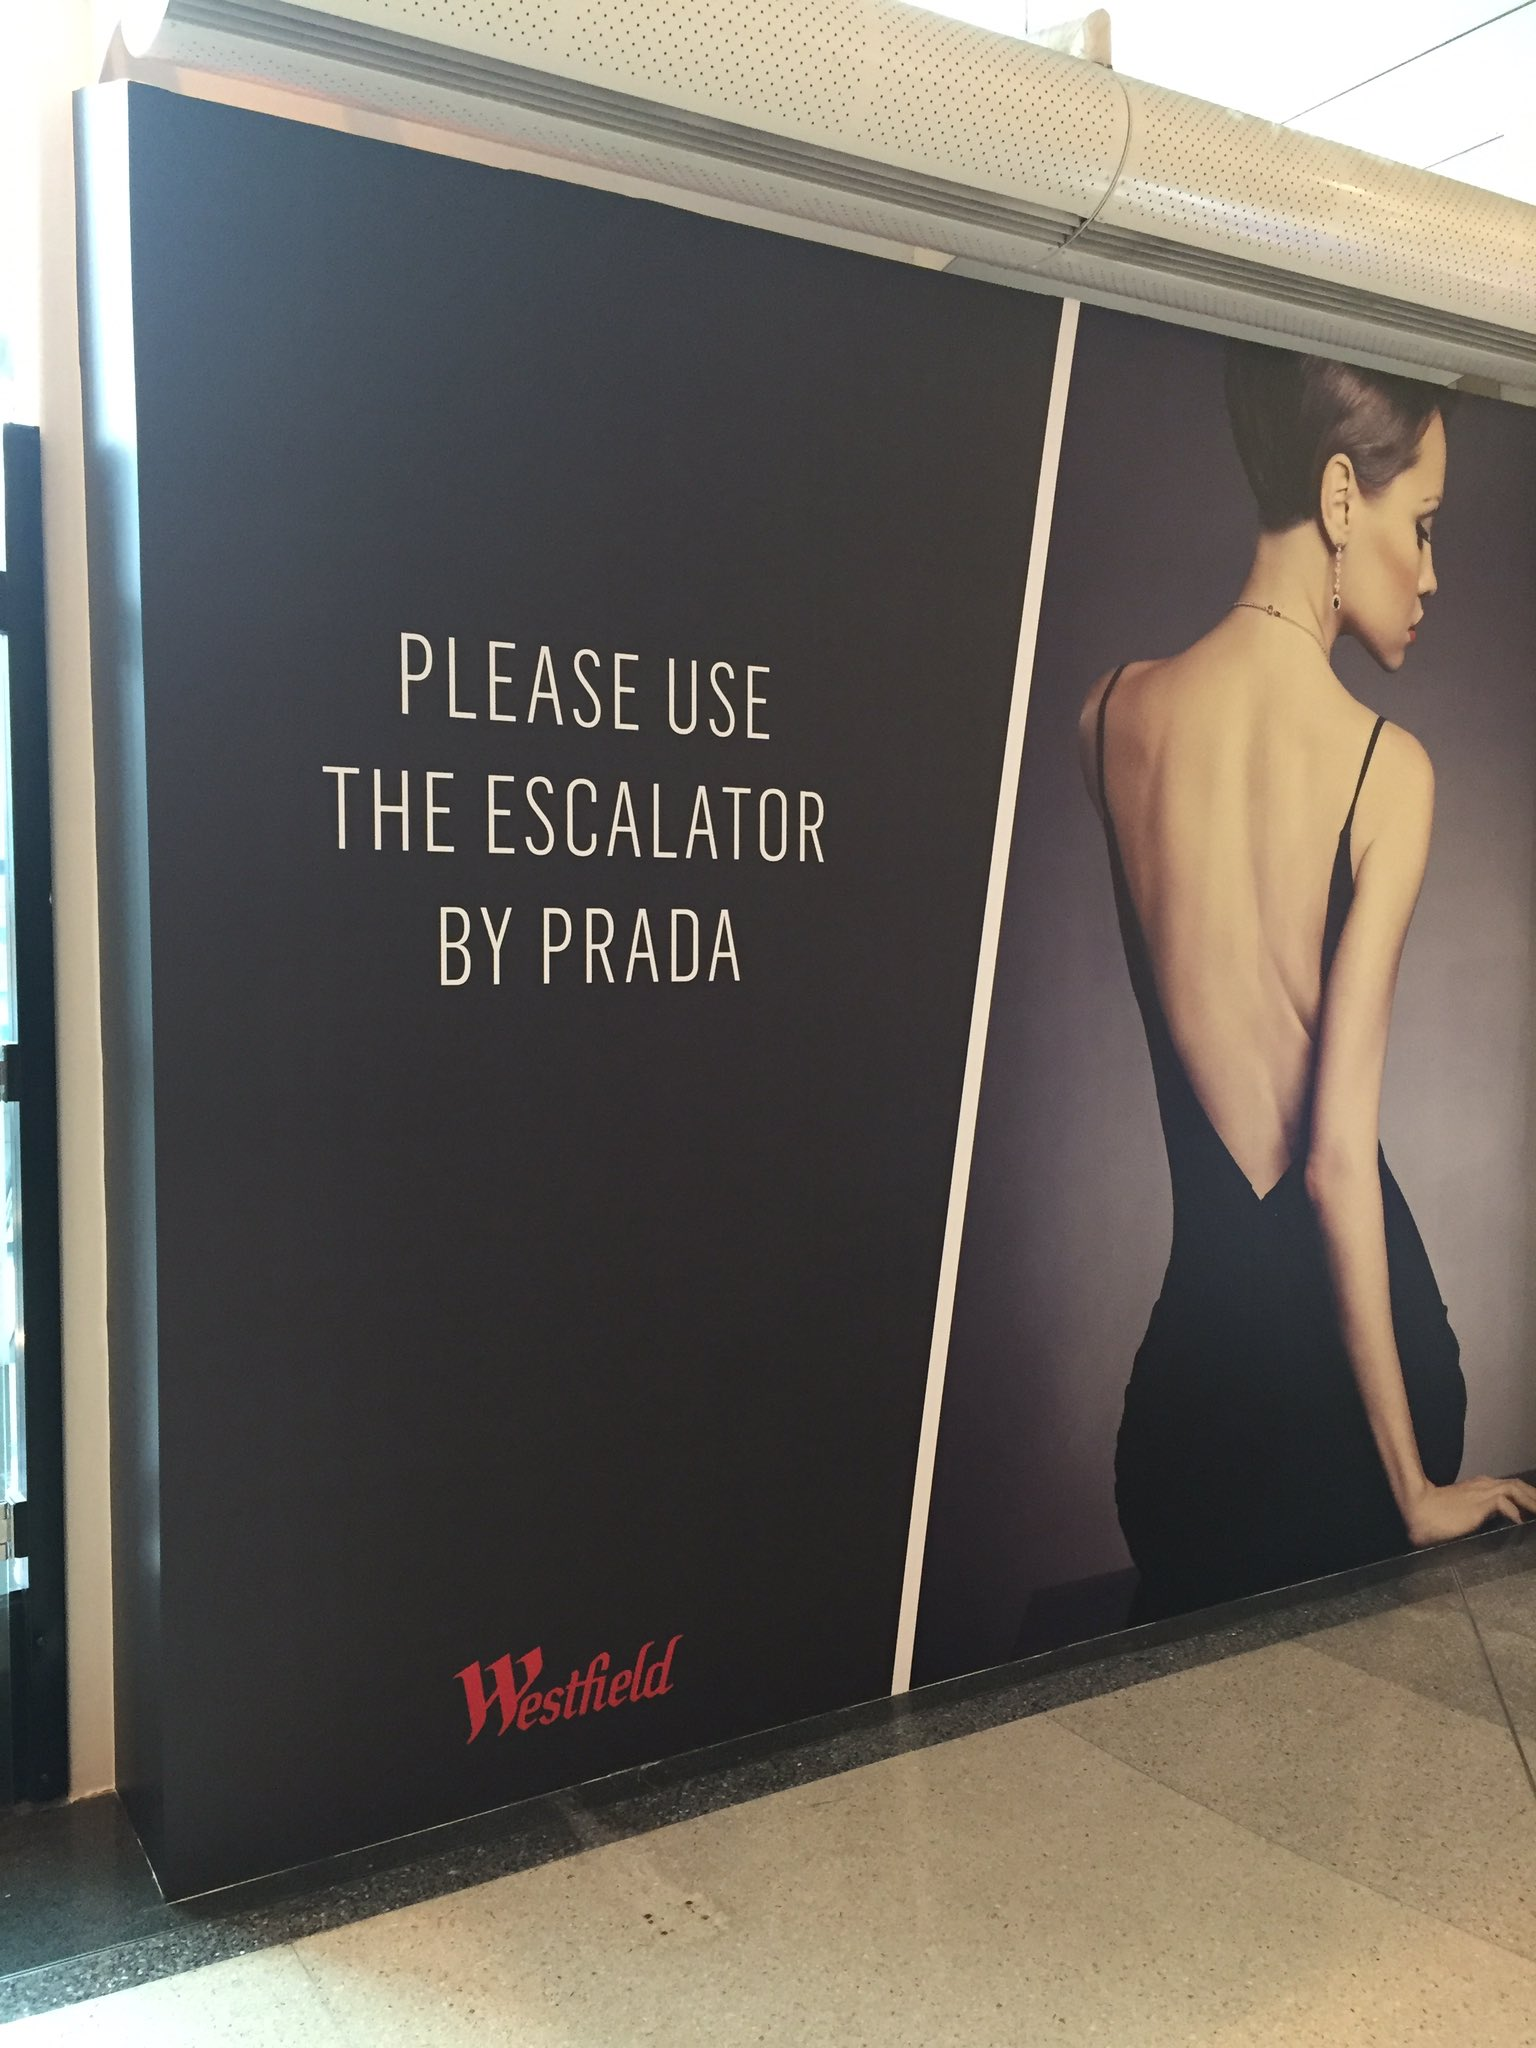 Worst. Perfume. Name. Ever. https://t.co/9dSIMx3MWf